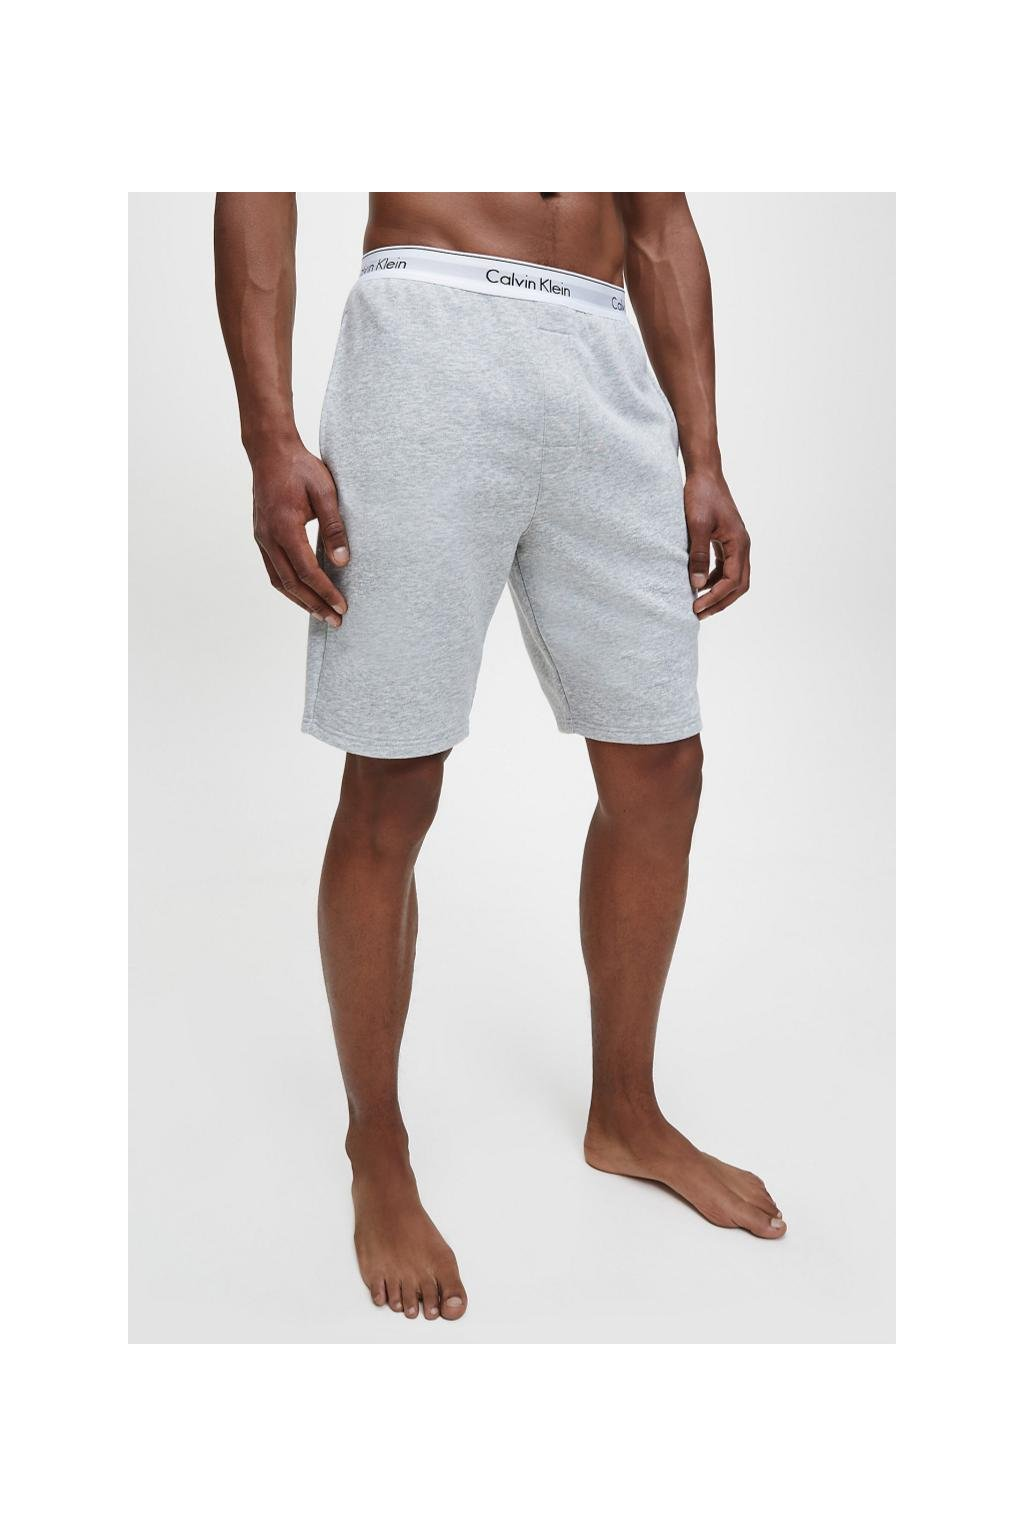 Calvin Klein Modern Cotton šortky - šedé